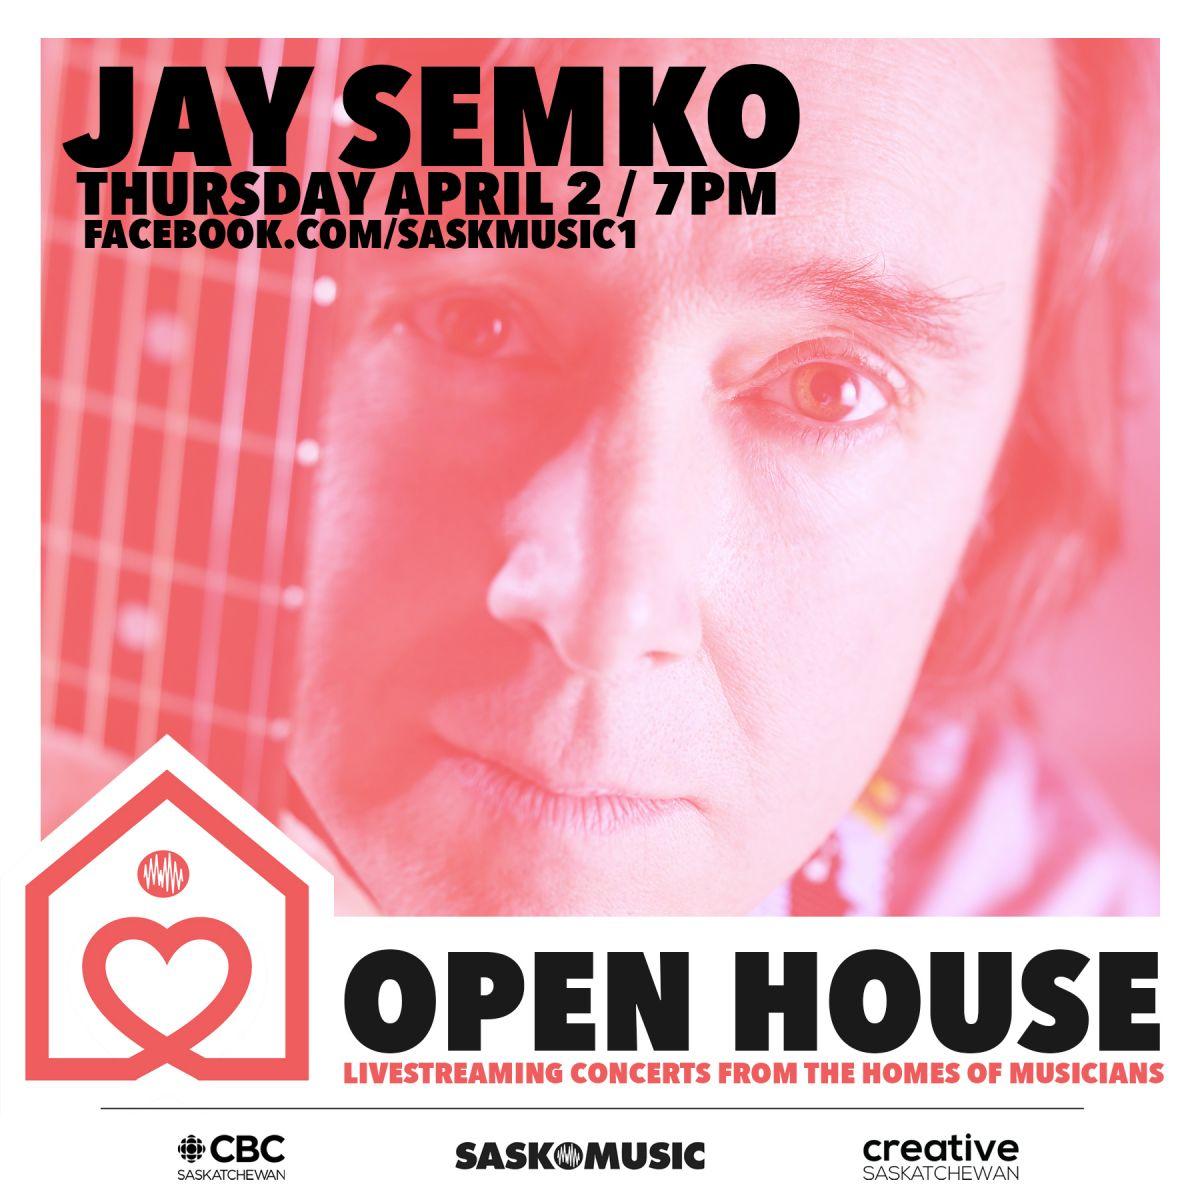 Jay Semko